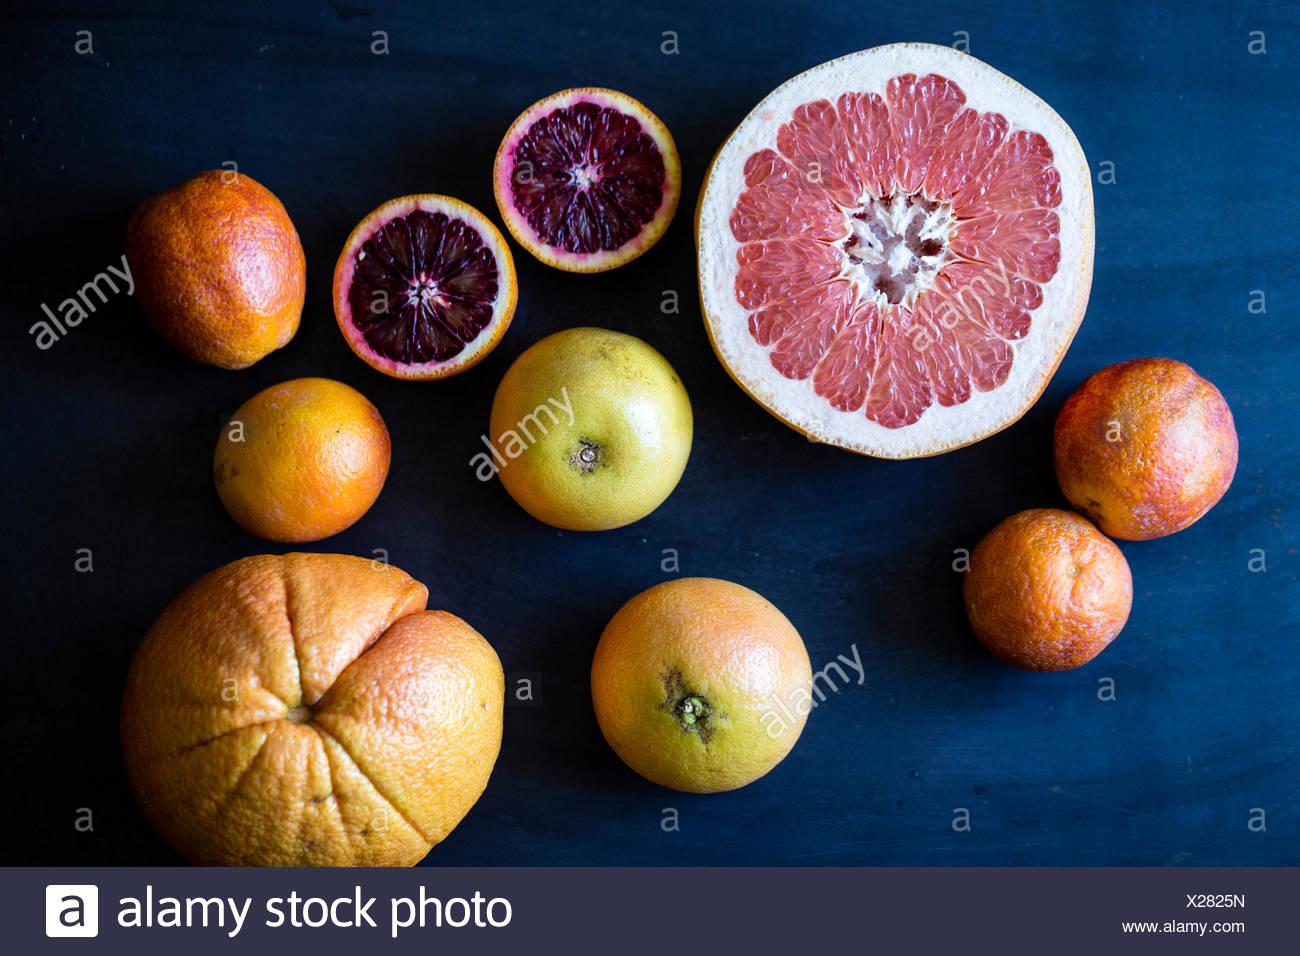 Citrus fruits and a blue background. Grapefruits, oranges, blood oranges. - Stock Image